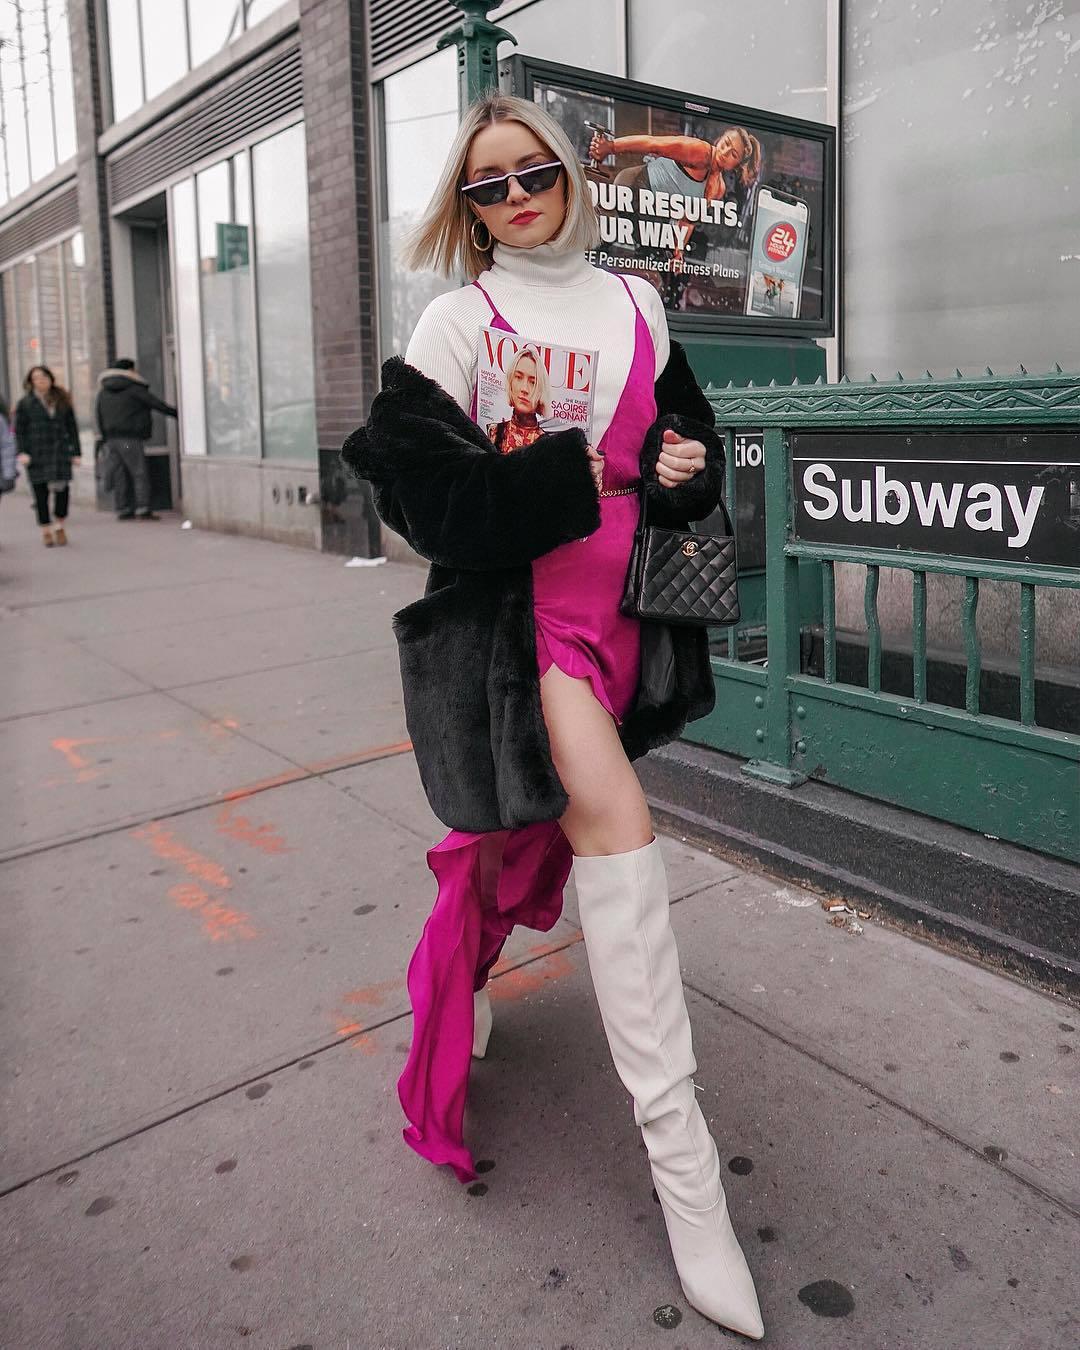 dress slit dress pink dress knee high boots high heels boots white boots white turtleneck top black coat faux fur coat chanel bag